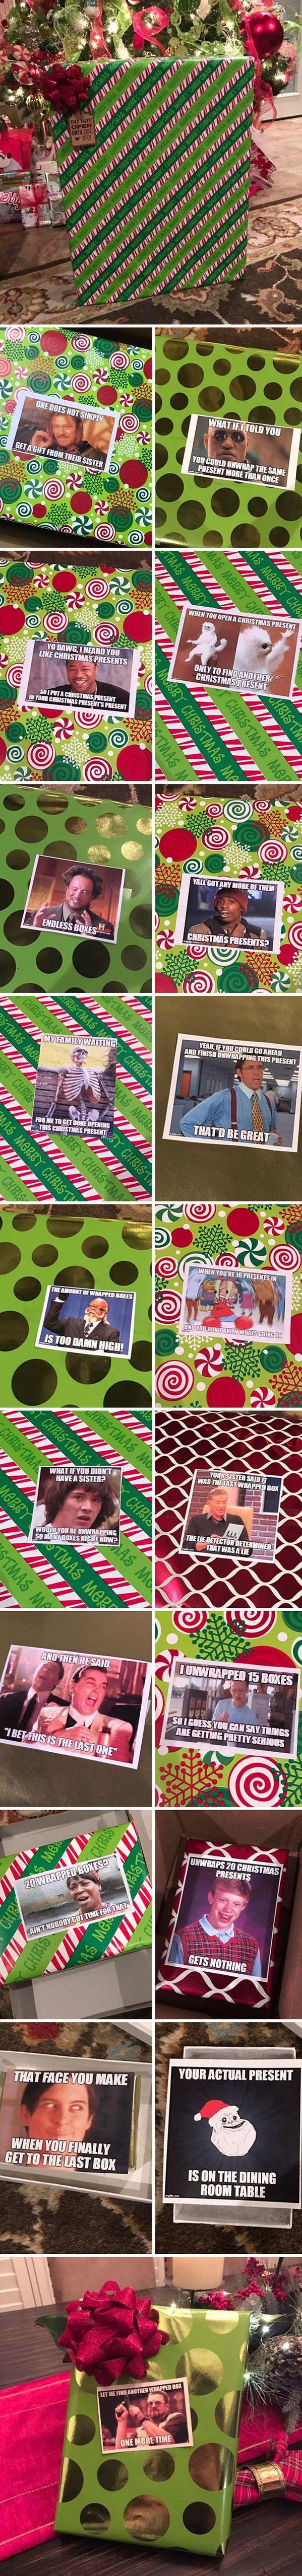 150 Funniest Christmas Gift Ideas